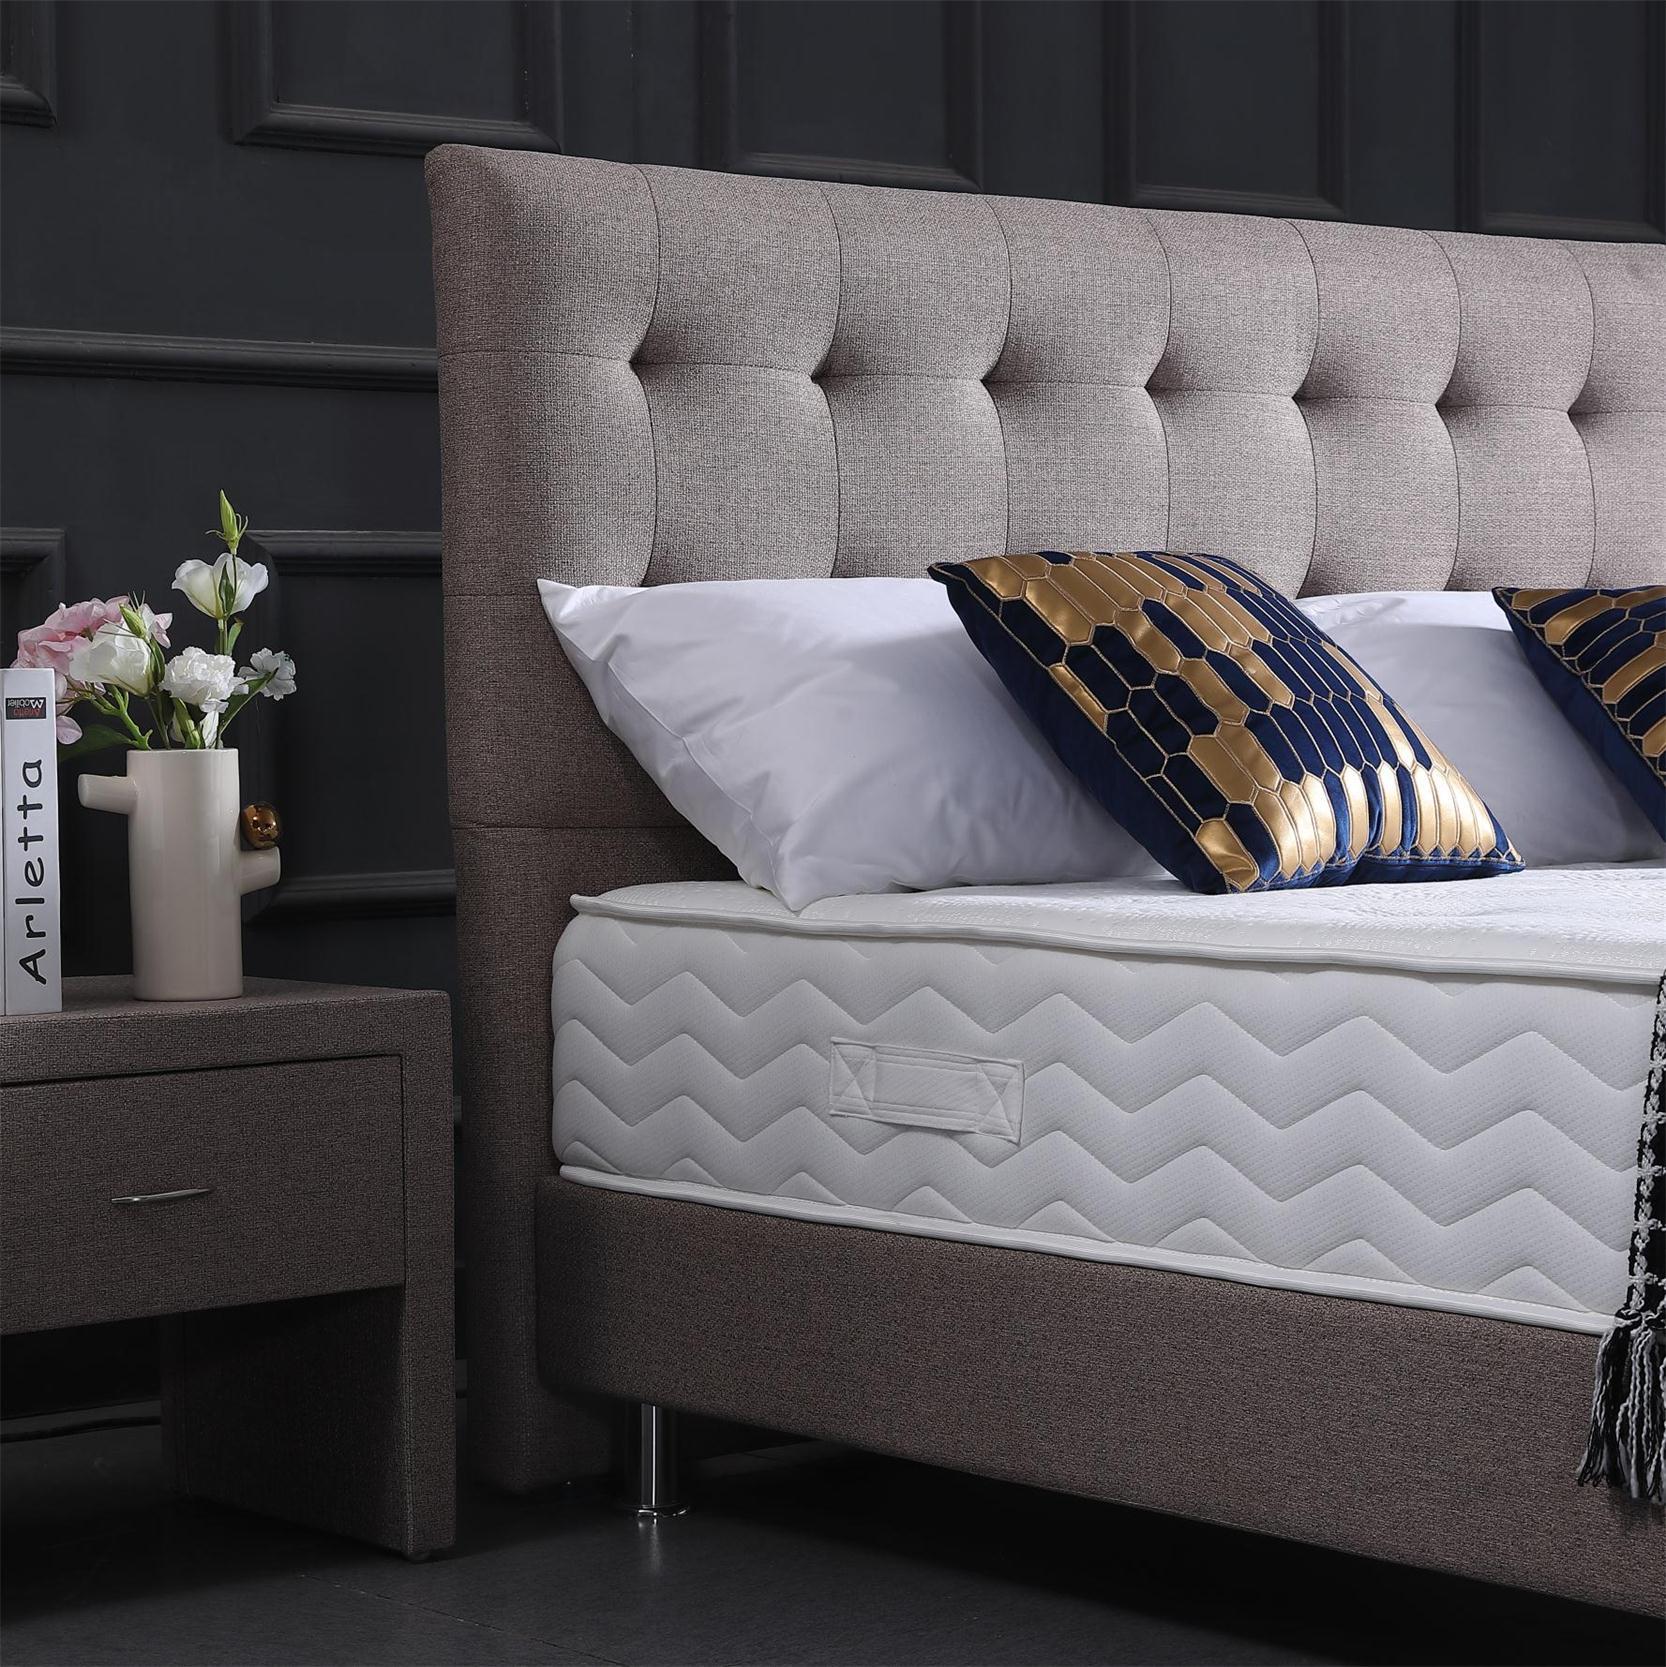 bamboo mattress density for Home-2